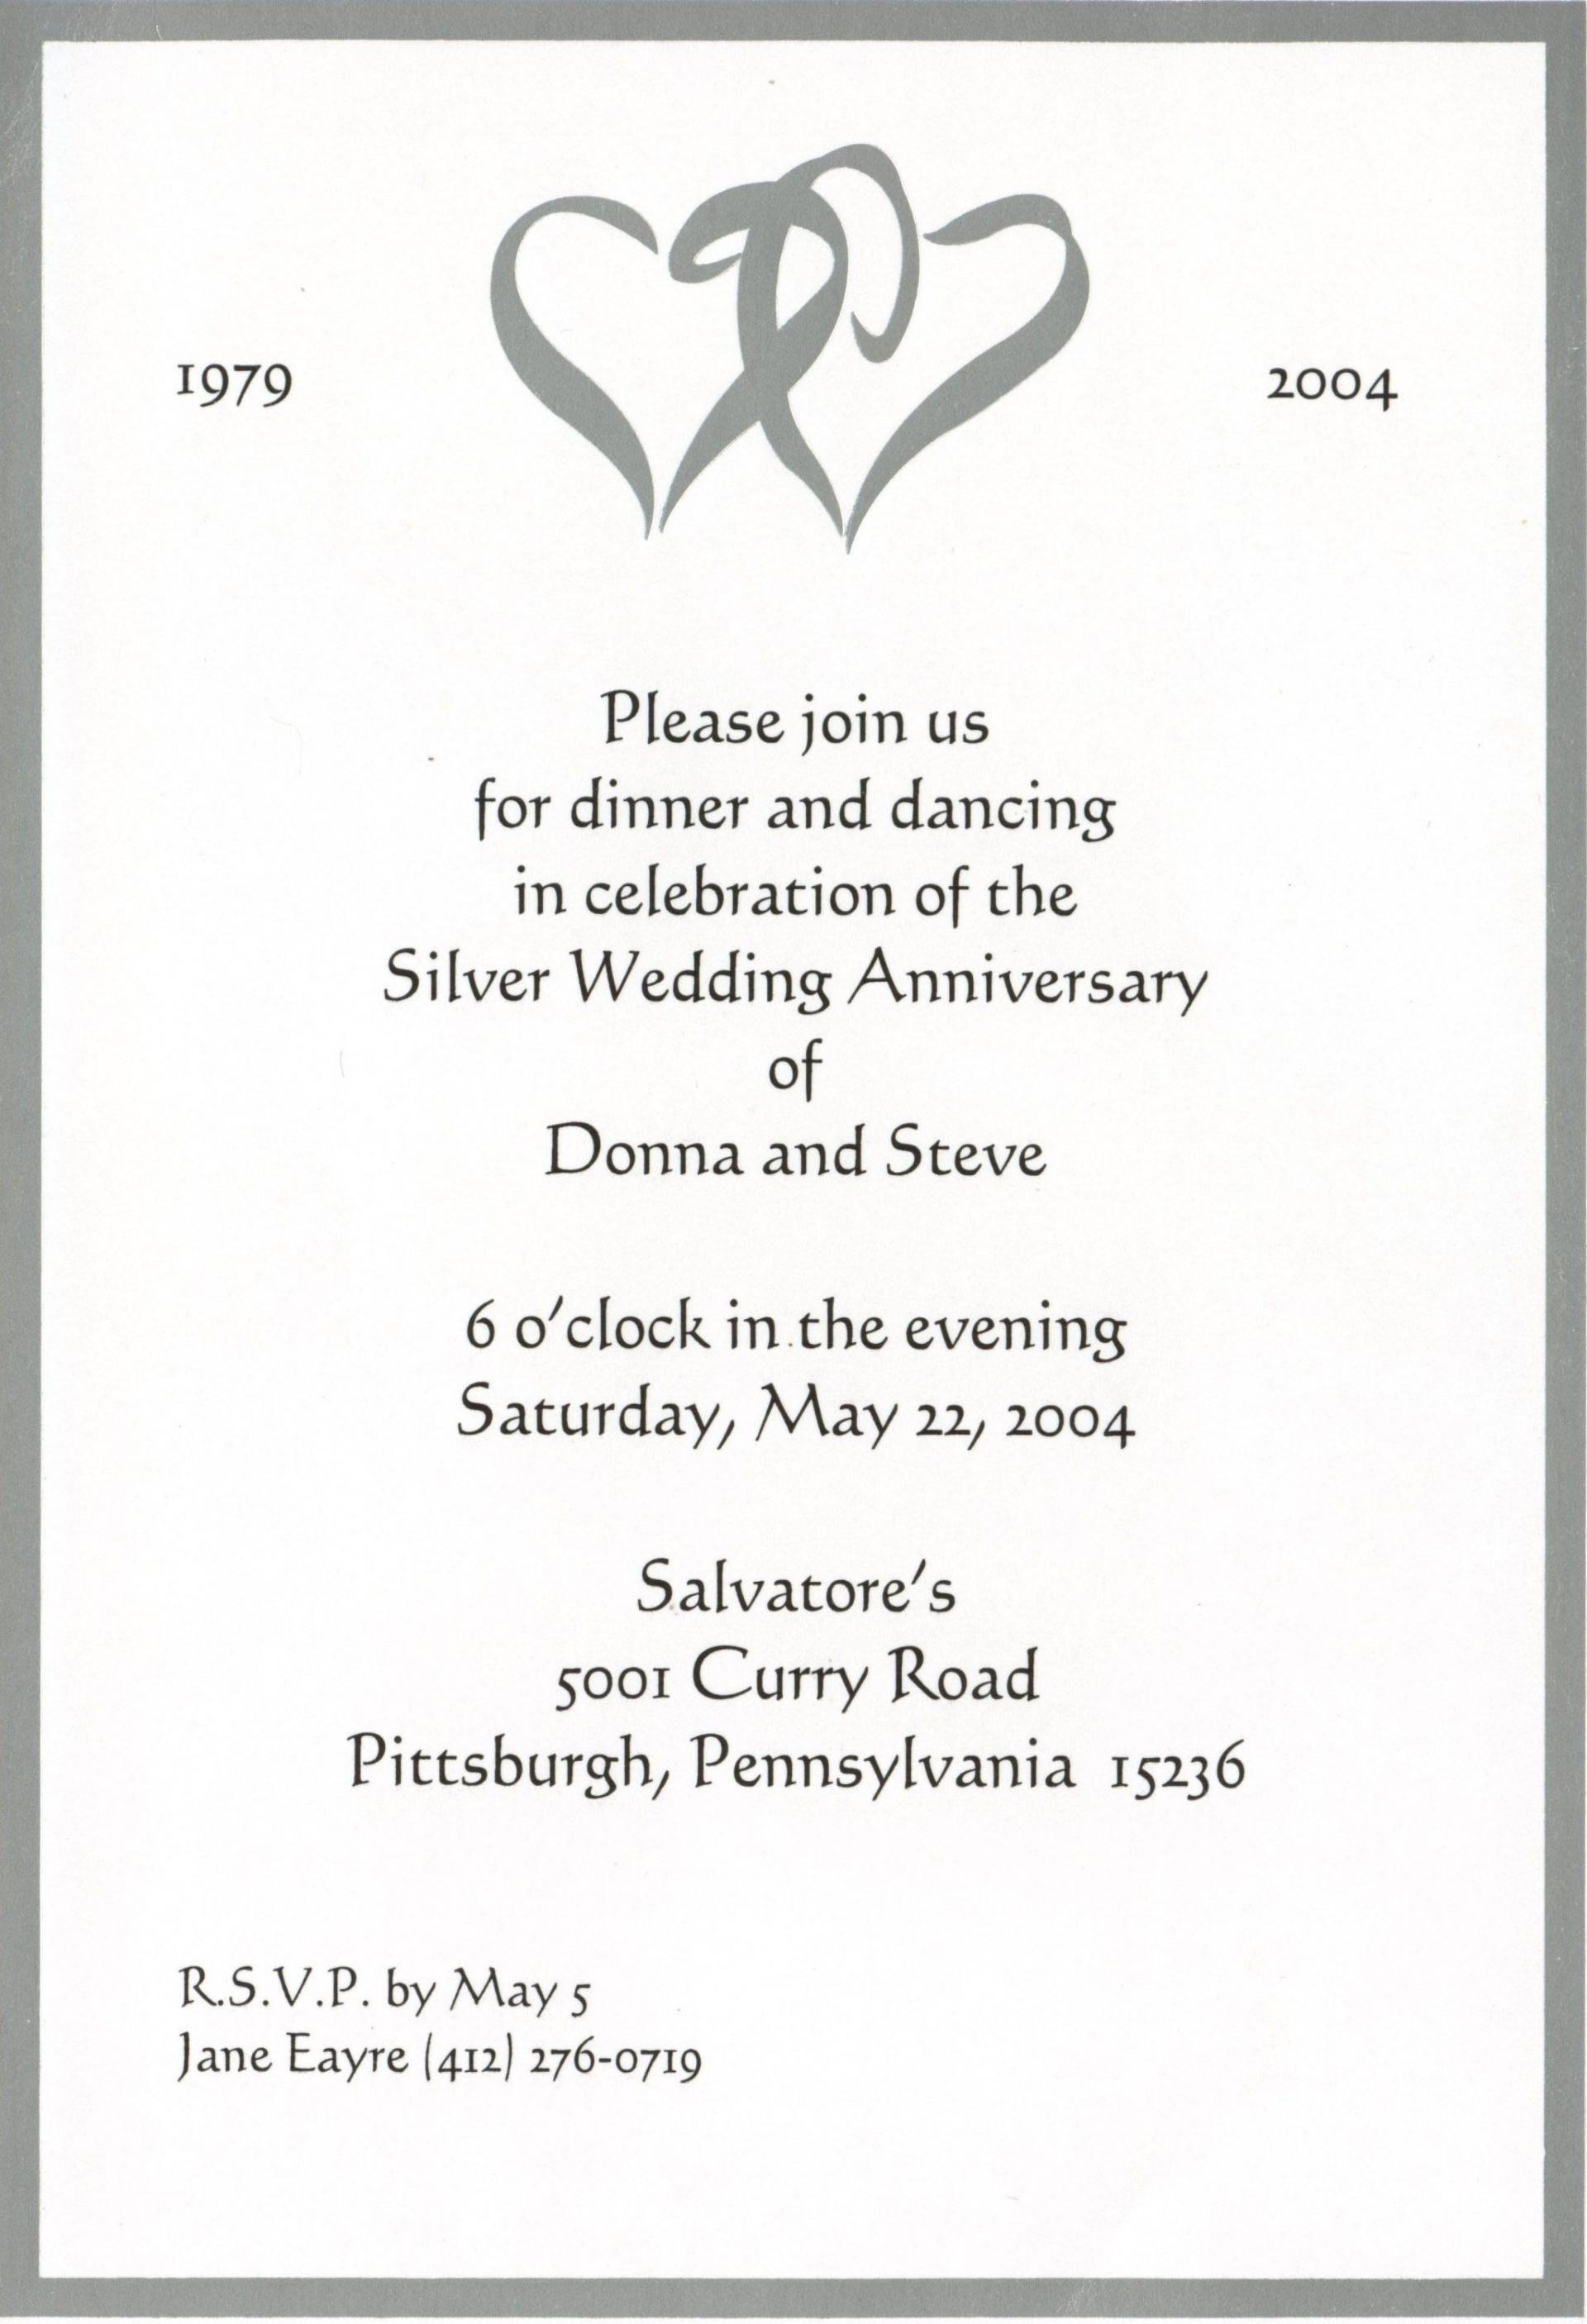 001 Sensational 50th Wedding Anniversary Invitation Card Template Idea  Templates Sample1920